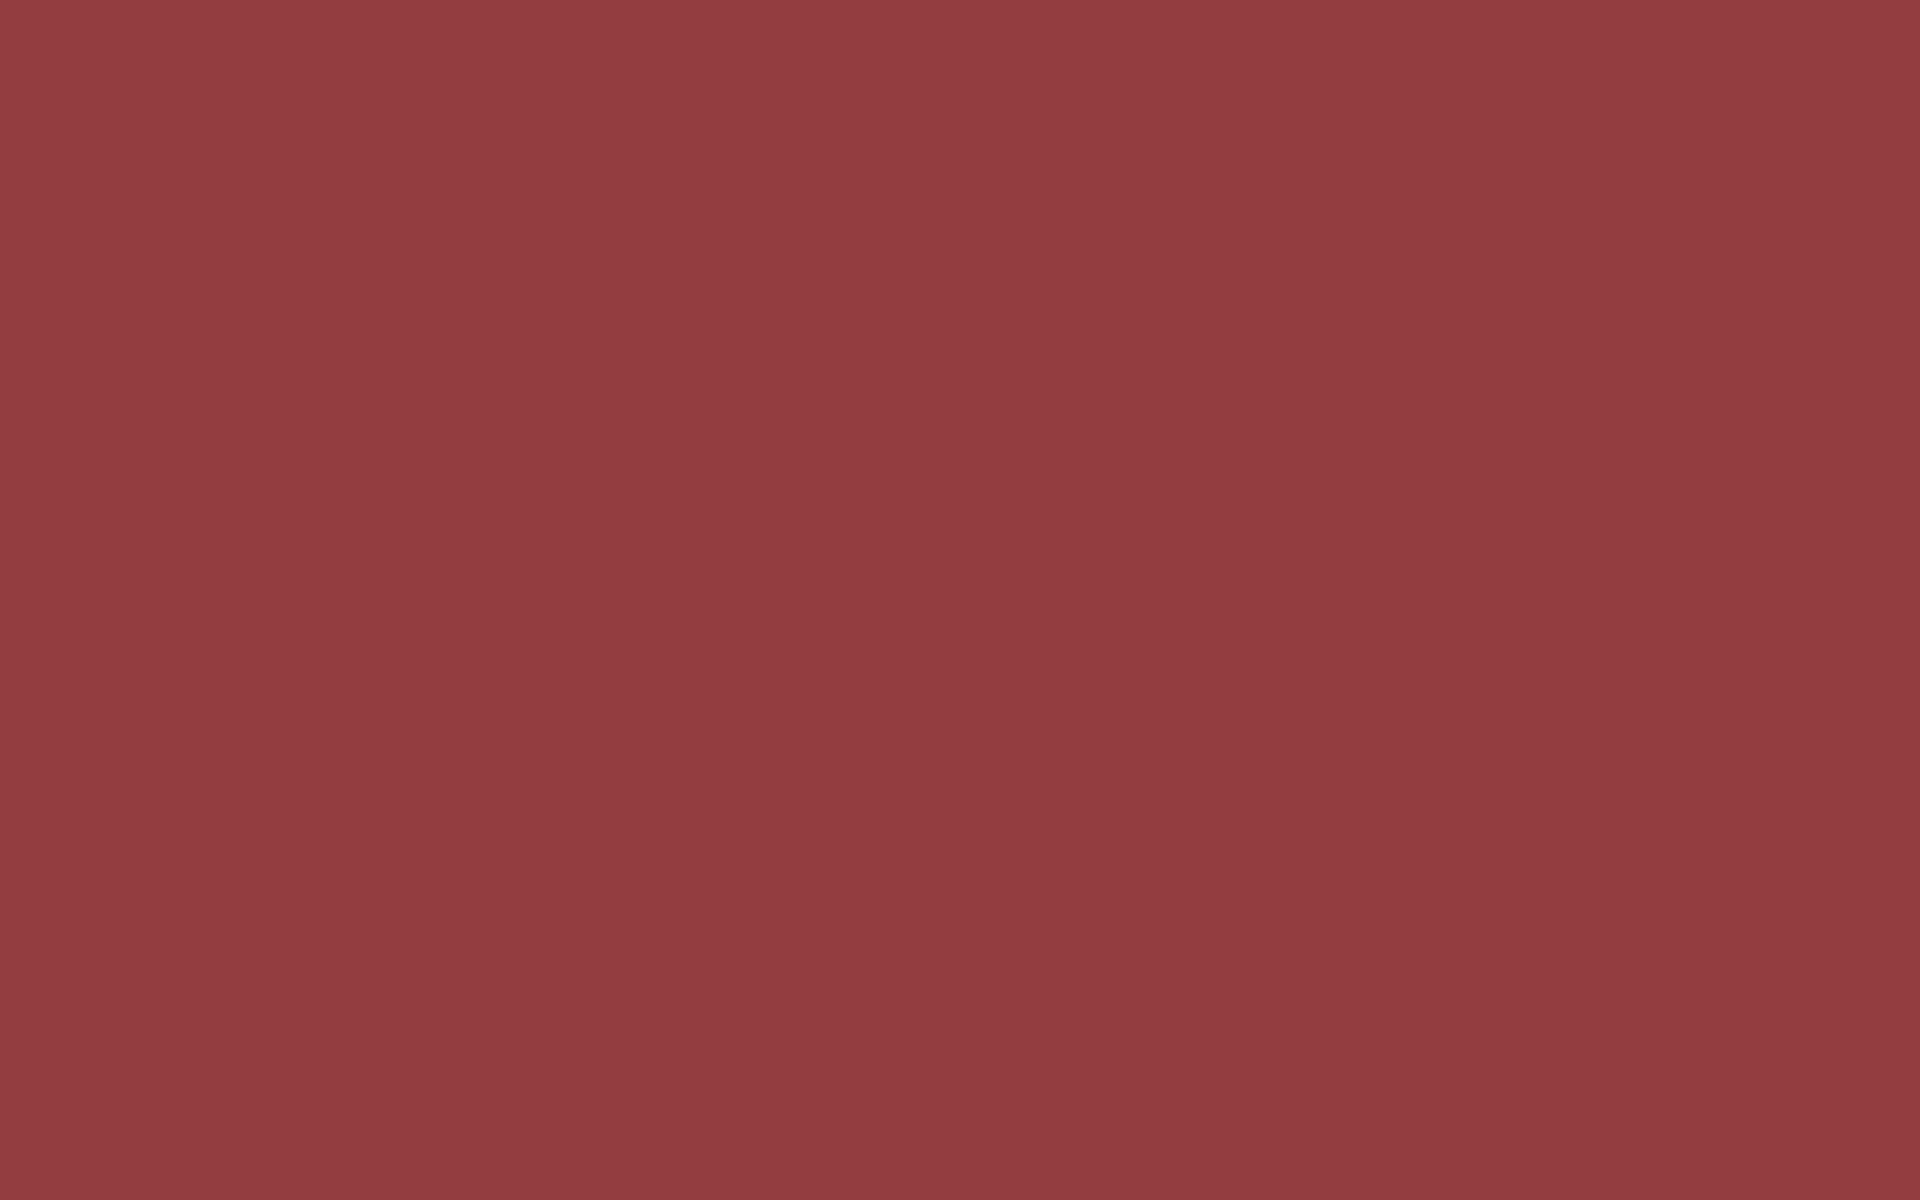 1920x1200 Smokey Topaz Solid Color Background